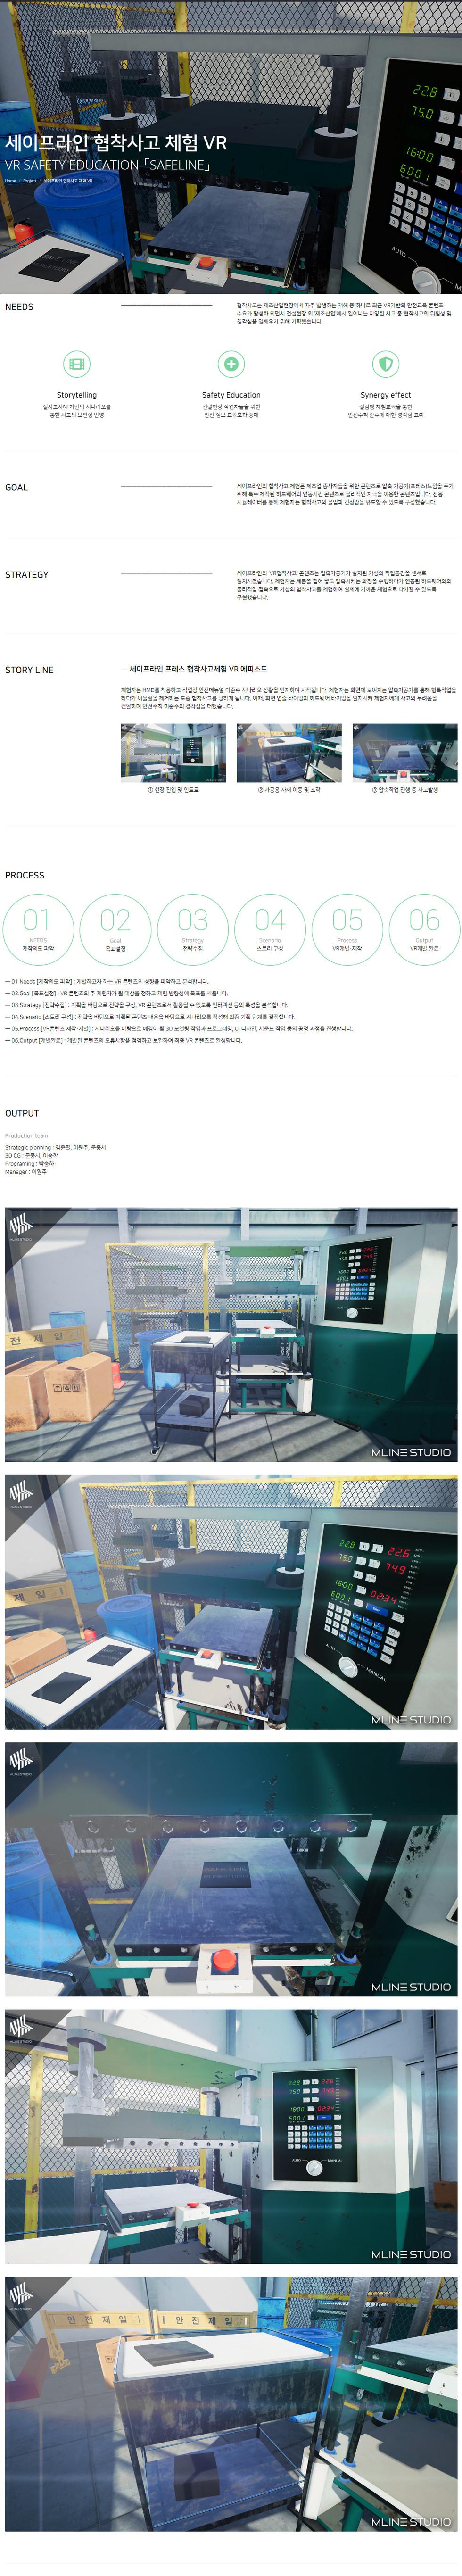 screencapture-m-line-tv-project-20170720